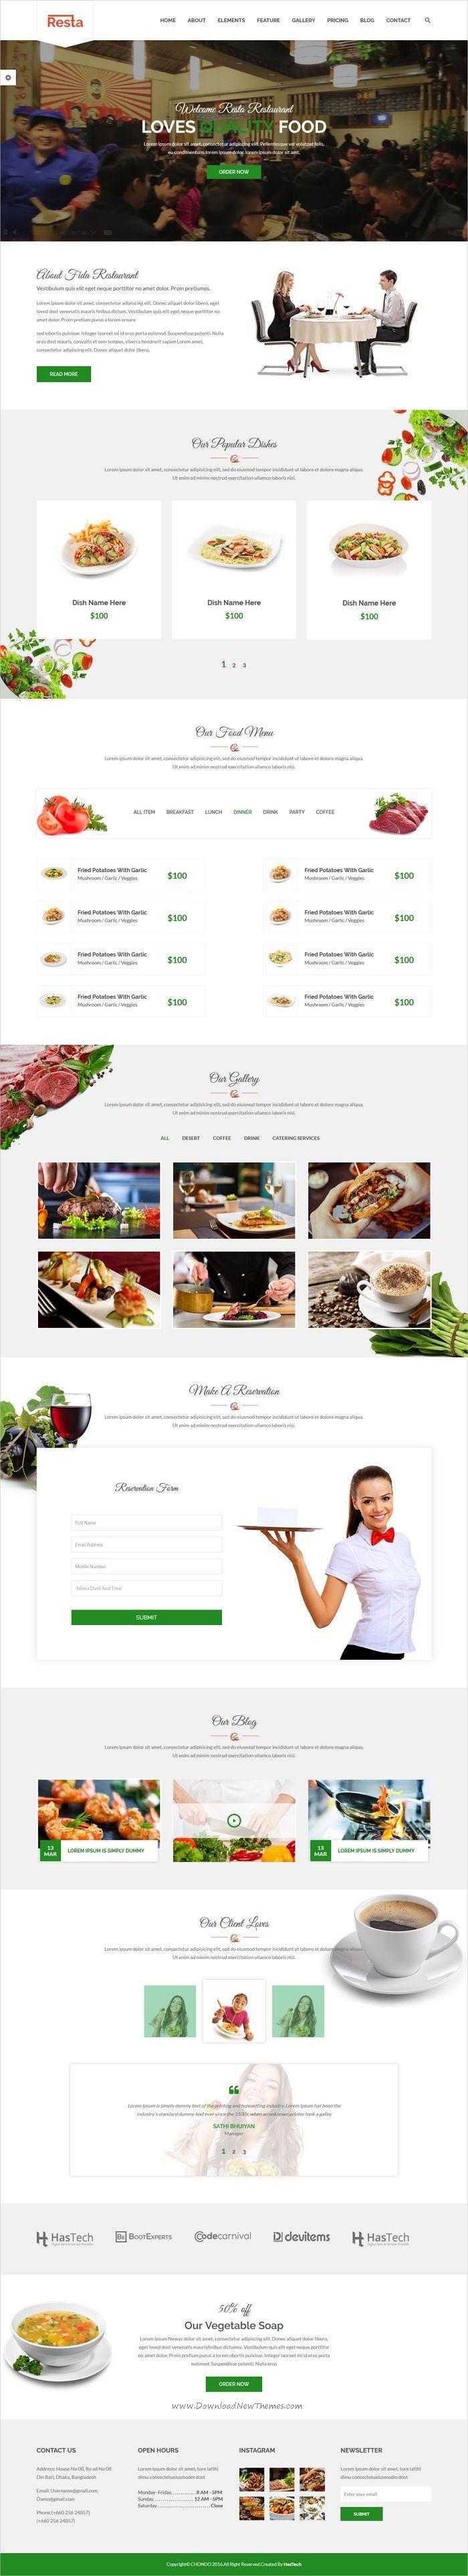 Resta Restaurant HTML Template 566 best